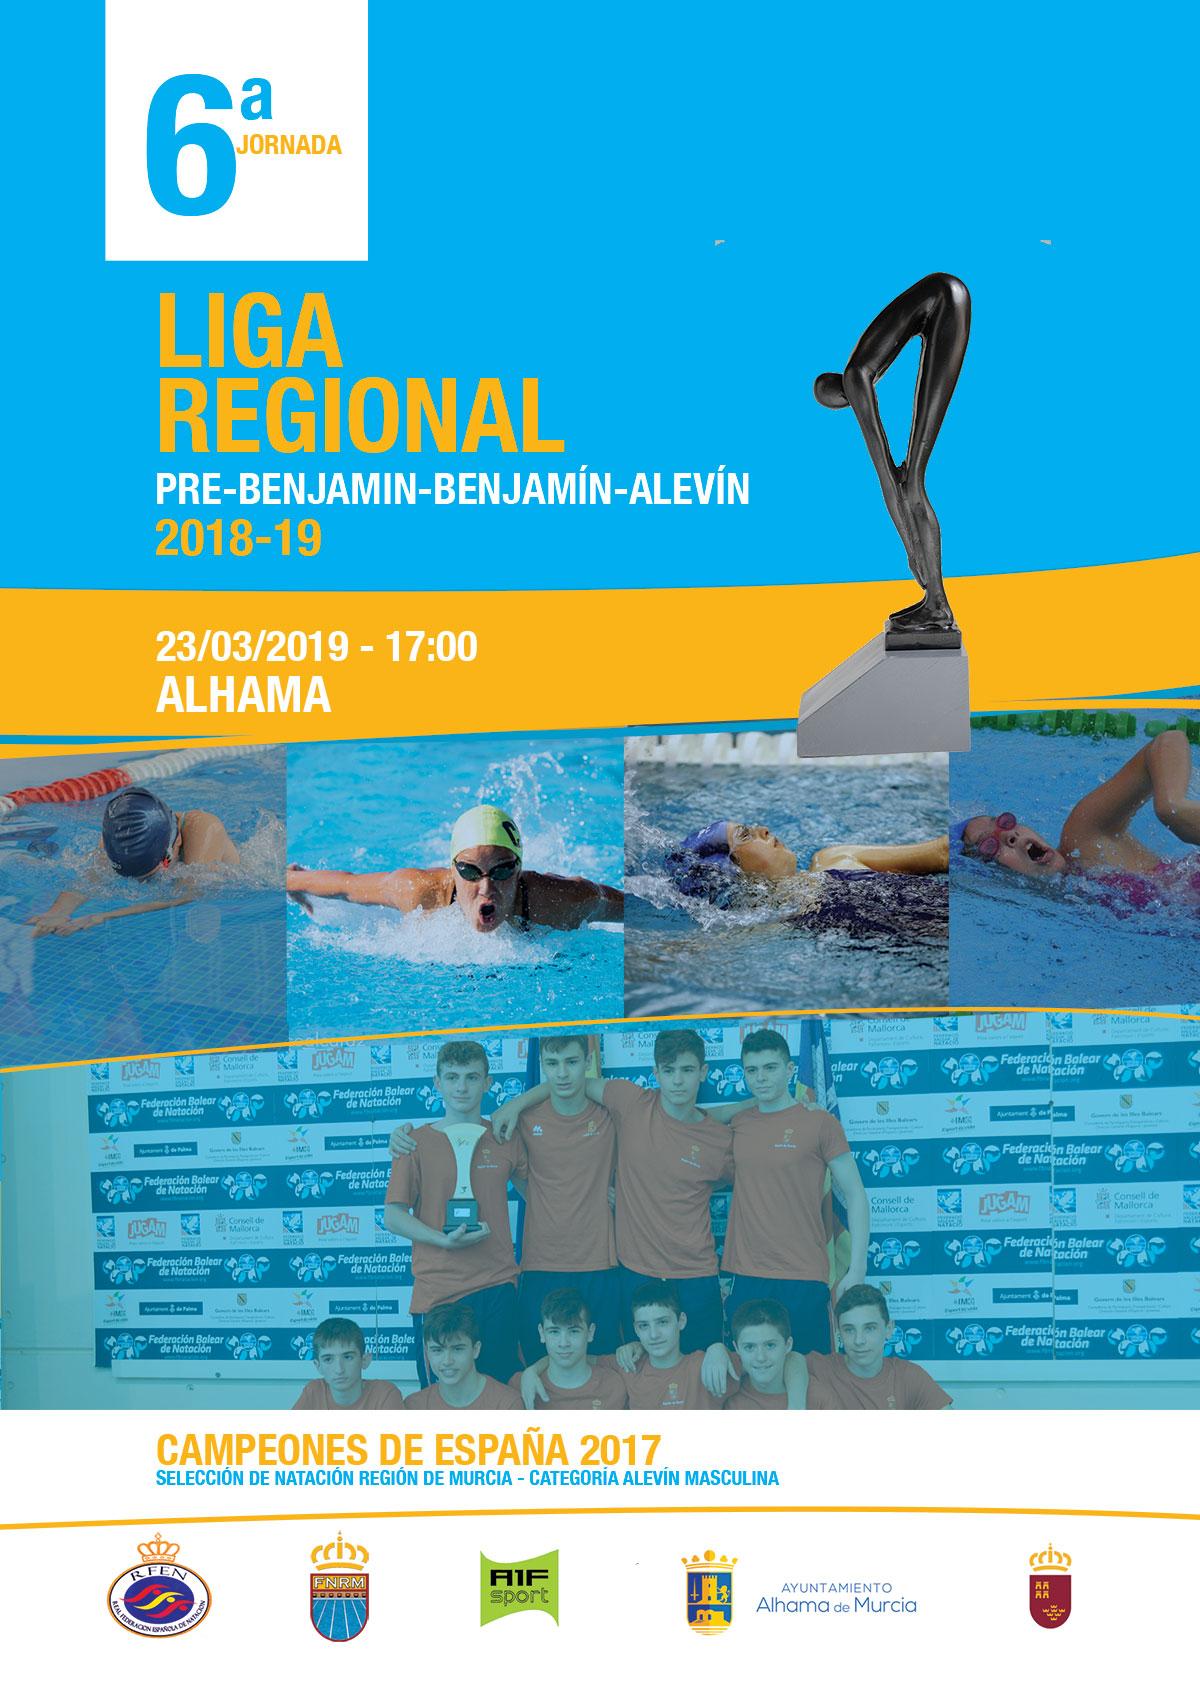 6AJORNADA-Liga-Regional-2018-PB-B-Alevin